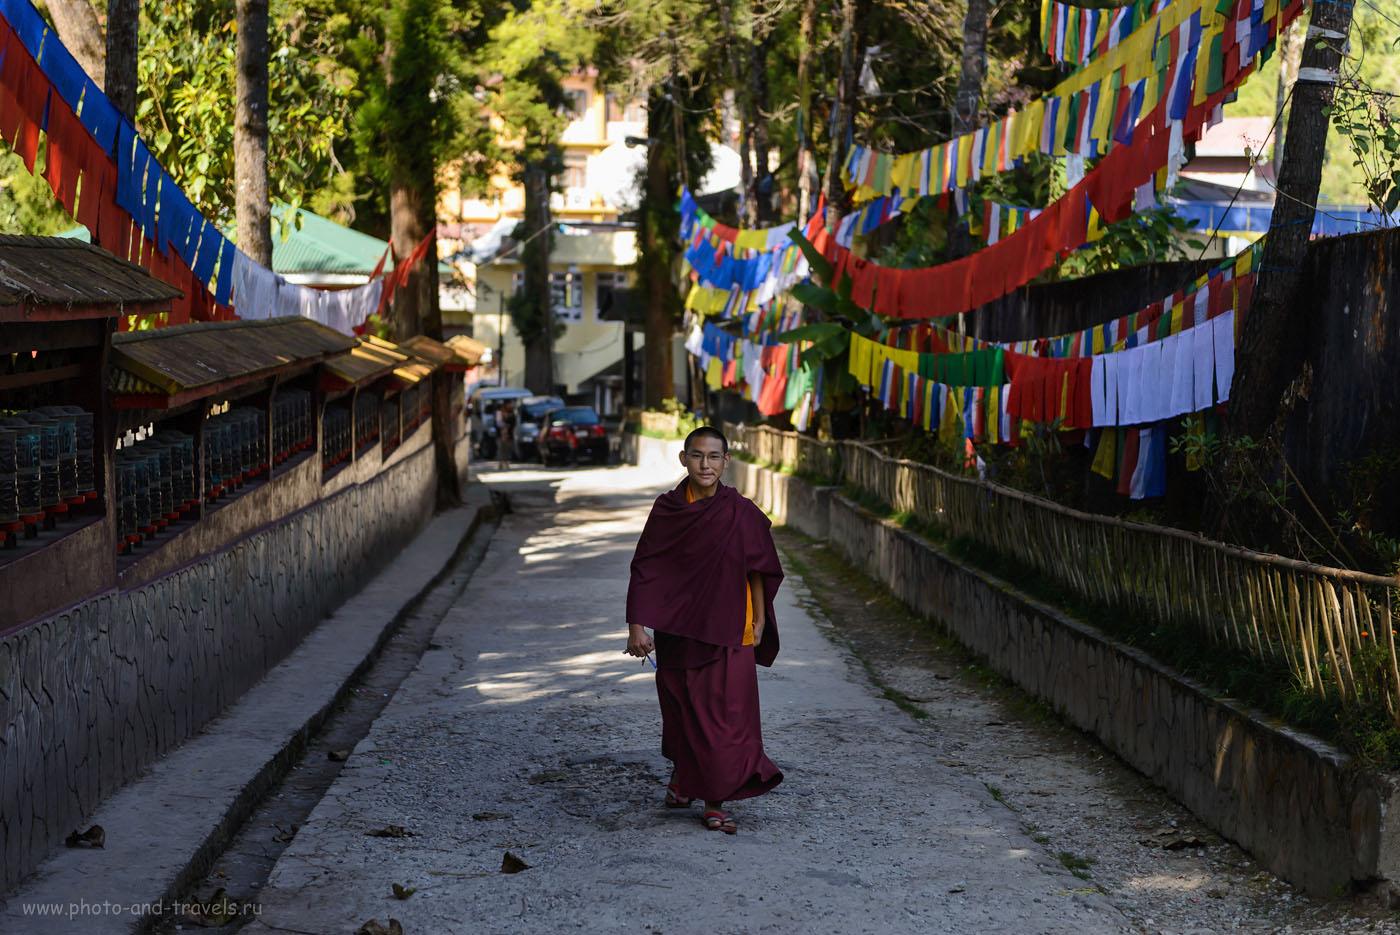 25. Монах в монастыреEnchey Monastery. 2.8, 1/200, 160, 70.